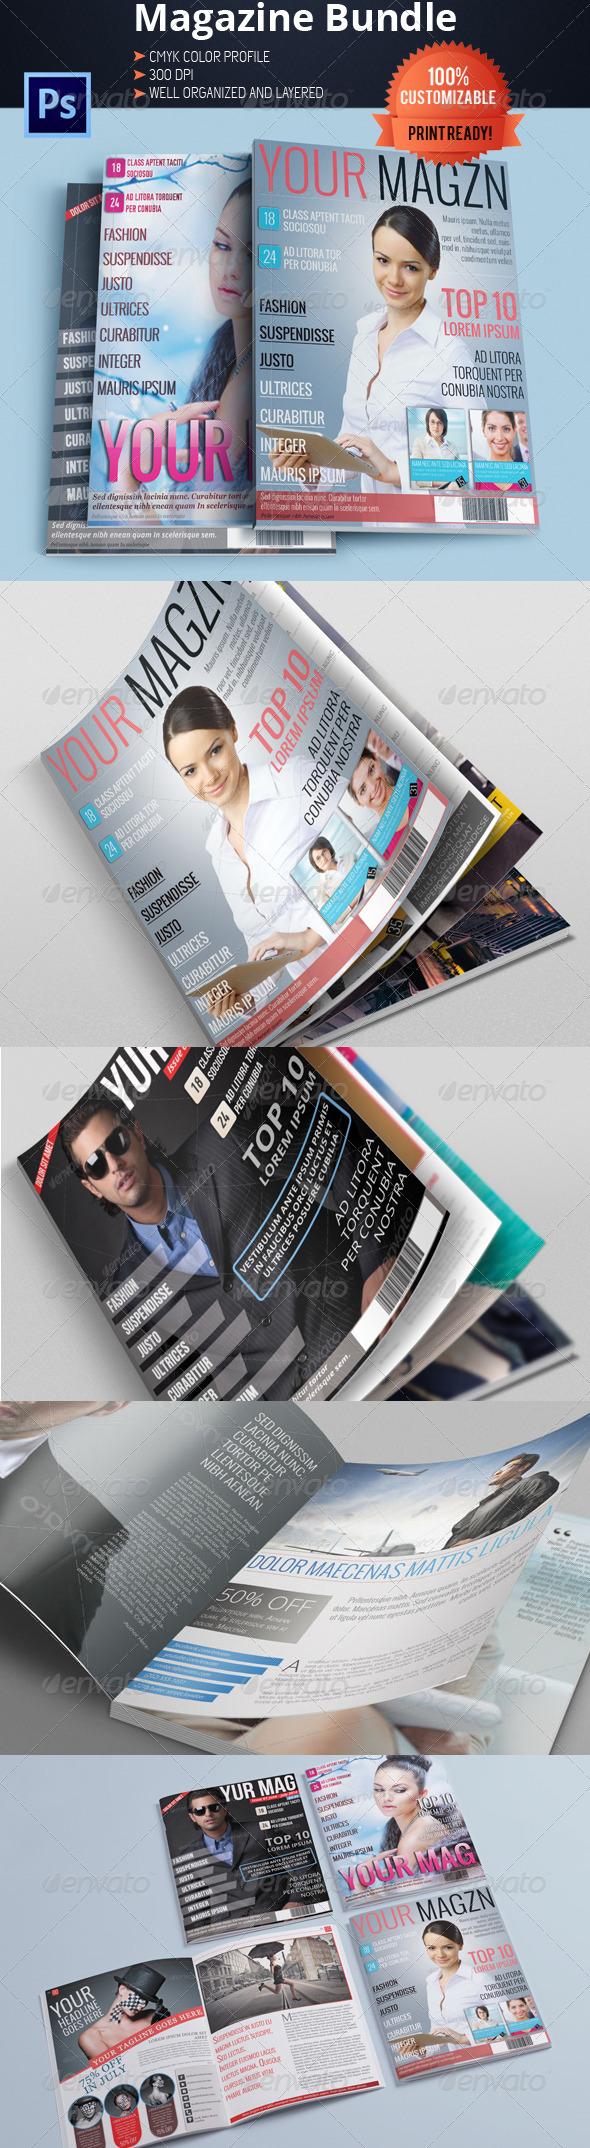 Magazine Template Bundle Vol.3 - Magazines Print Templates